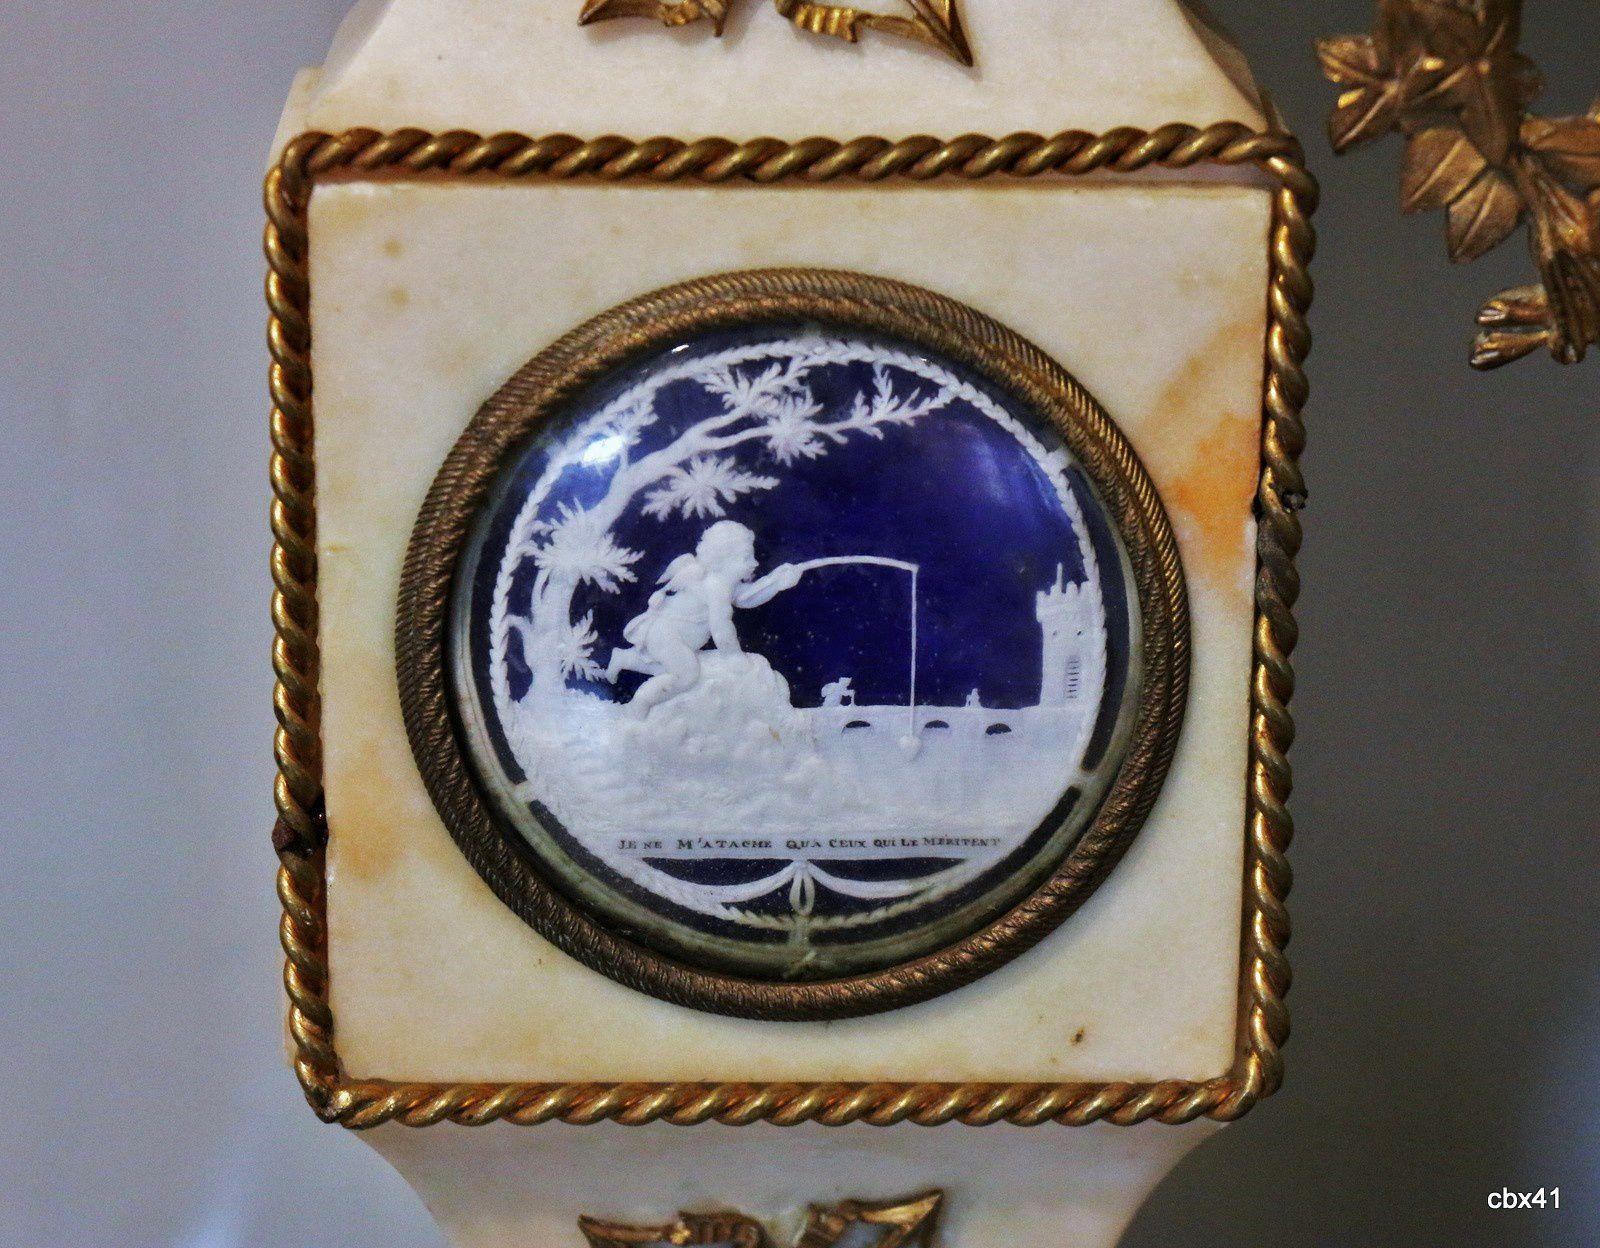 Pendule à balustre, château-musée de Dieppe